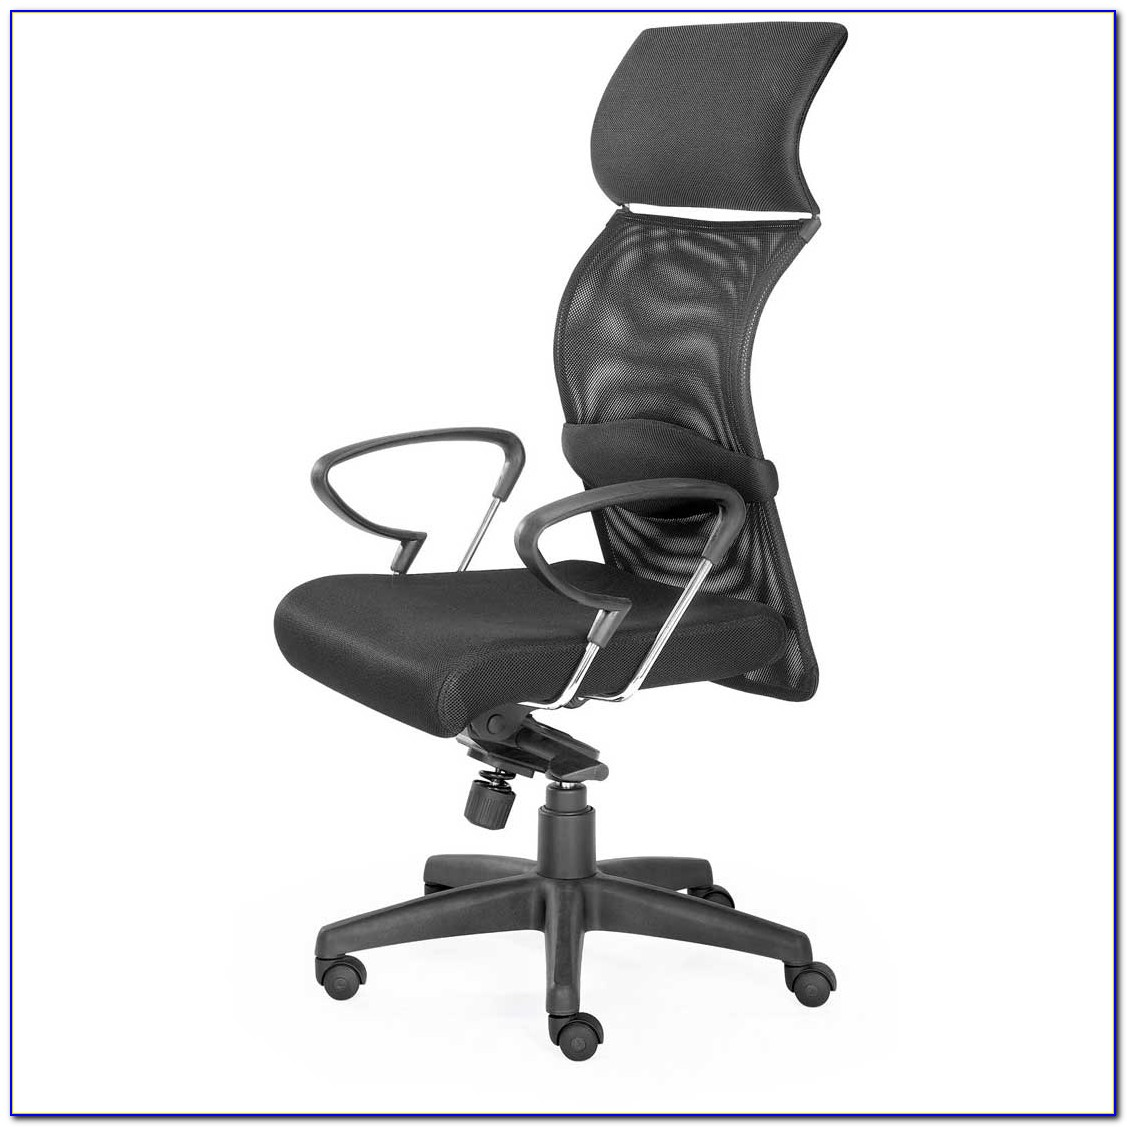 Ergonomic Desk Chairs Sydney